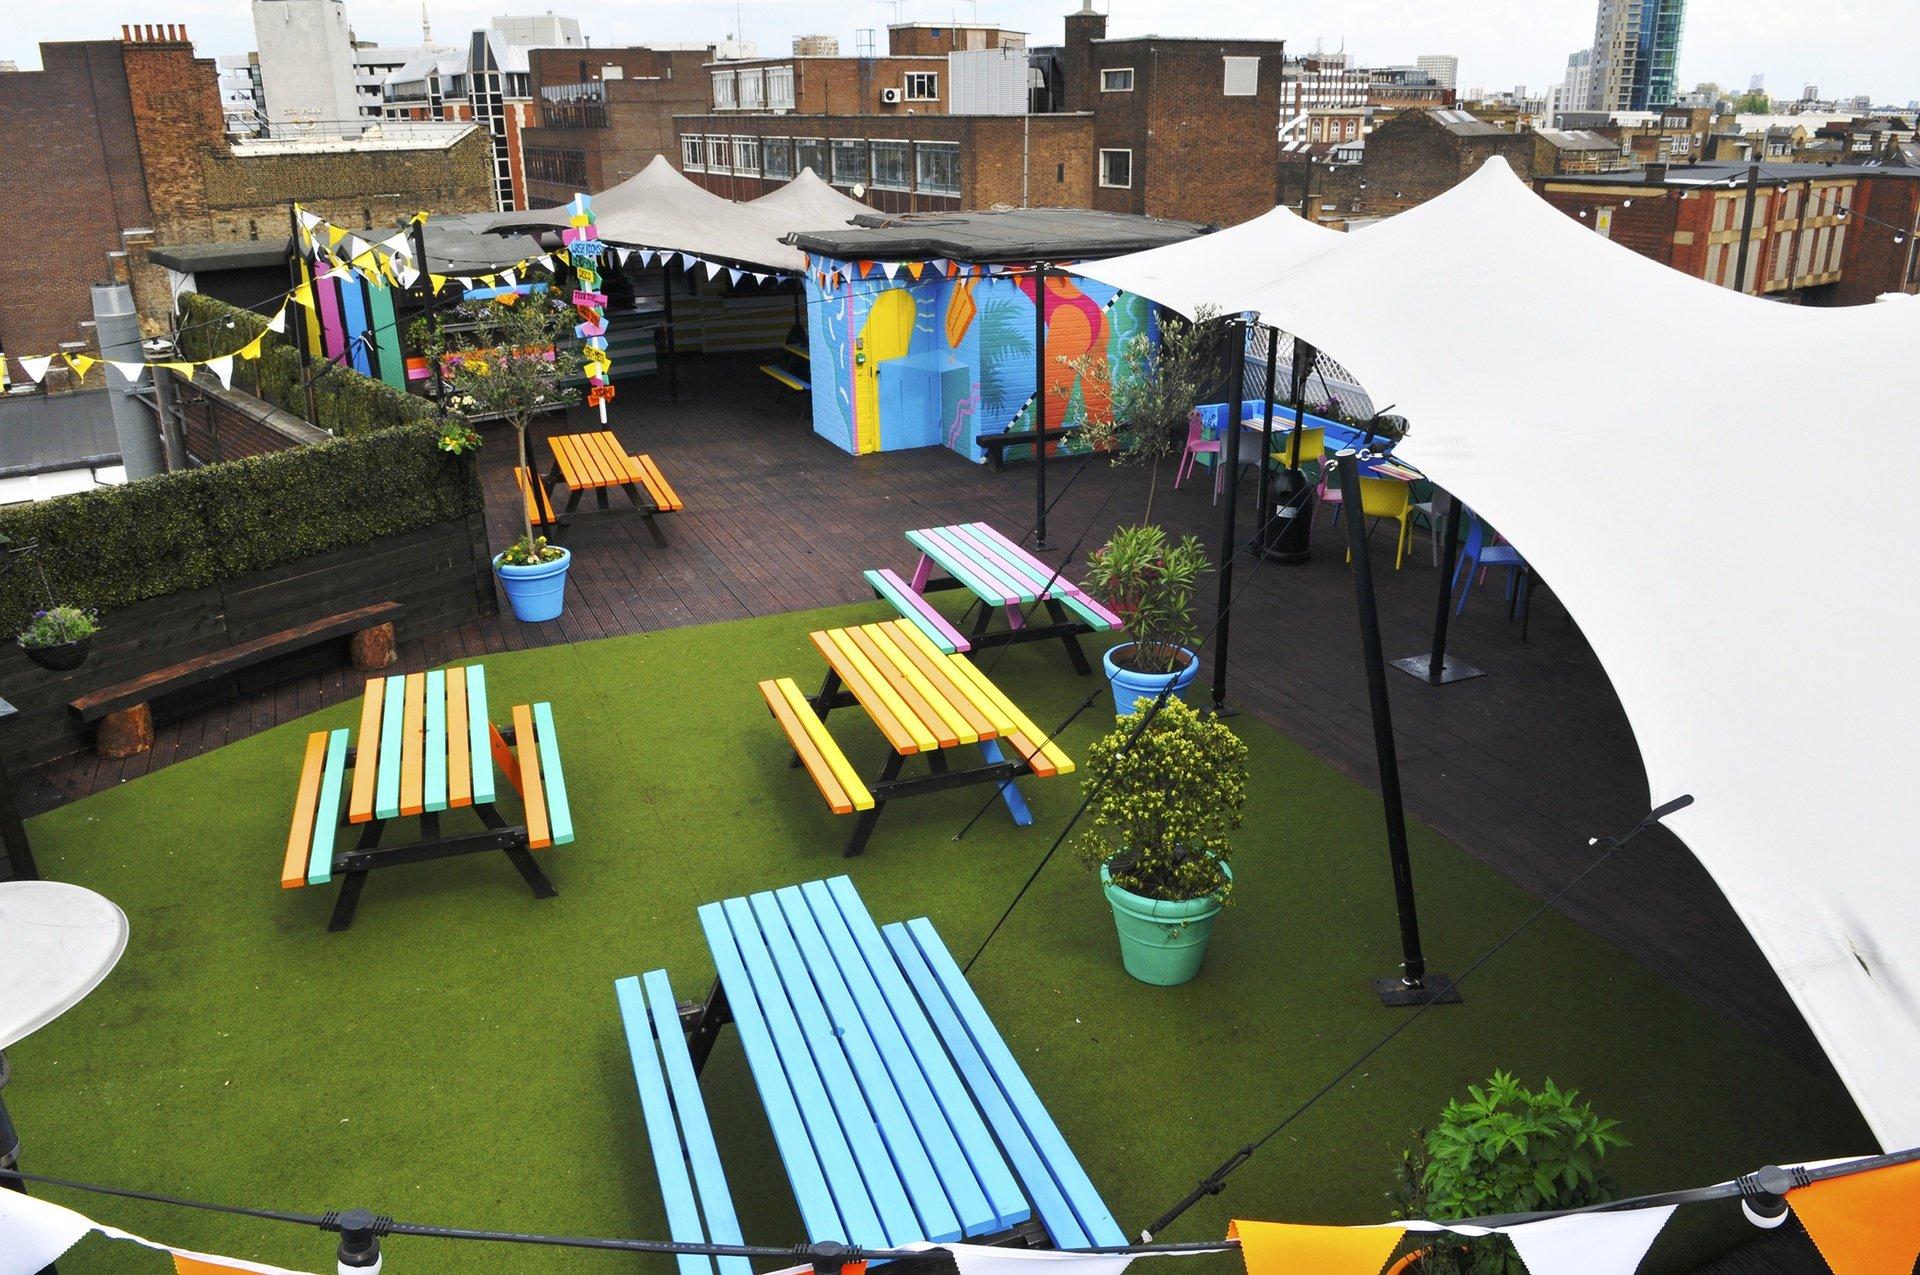 London workshop spaces Rooftop Queen of Hoxton - Rooftop image 0